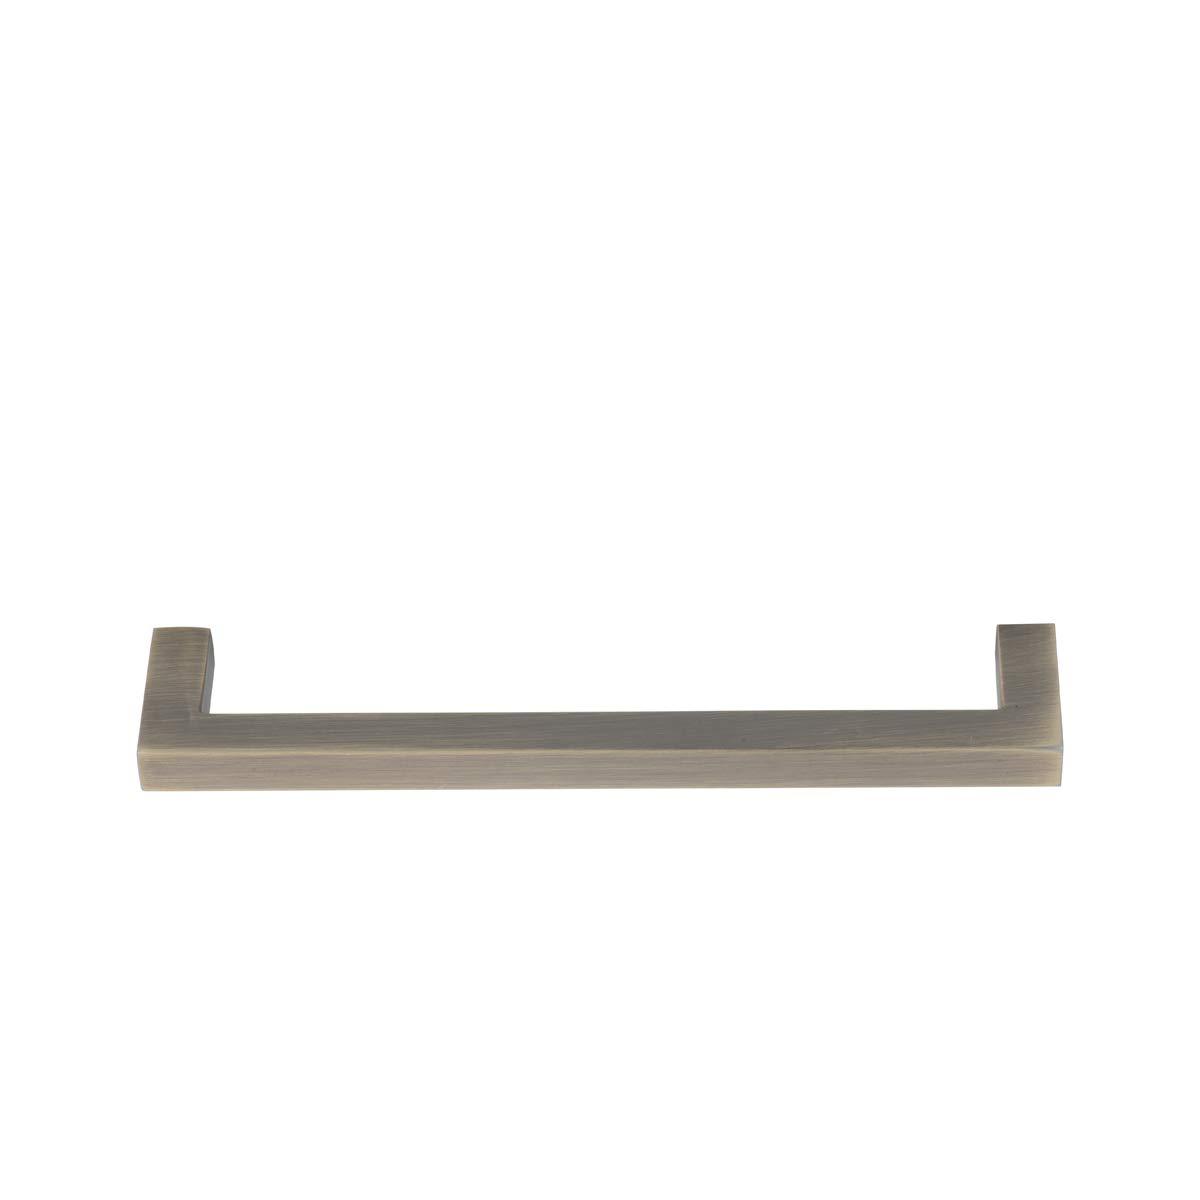 Basics Tirador de armario 12,7 cm centro del agujero AB3702-BB-10 lat/ón cepillado 14 cm de longitud